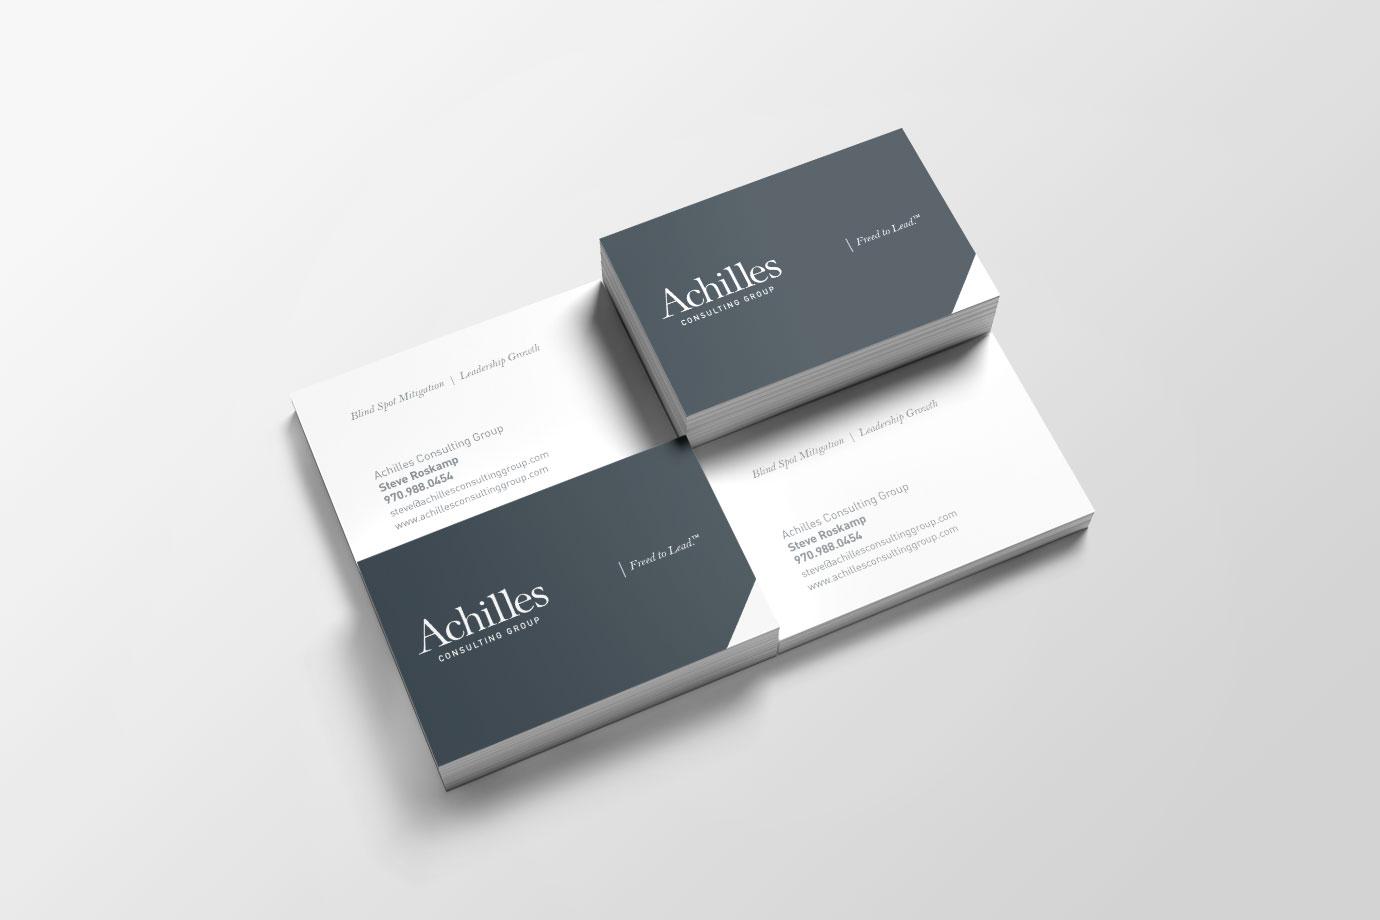 Achilles_Business_Card_Mockup_45-4-Stack.jpg